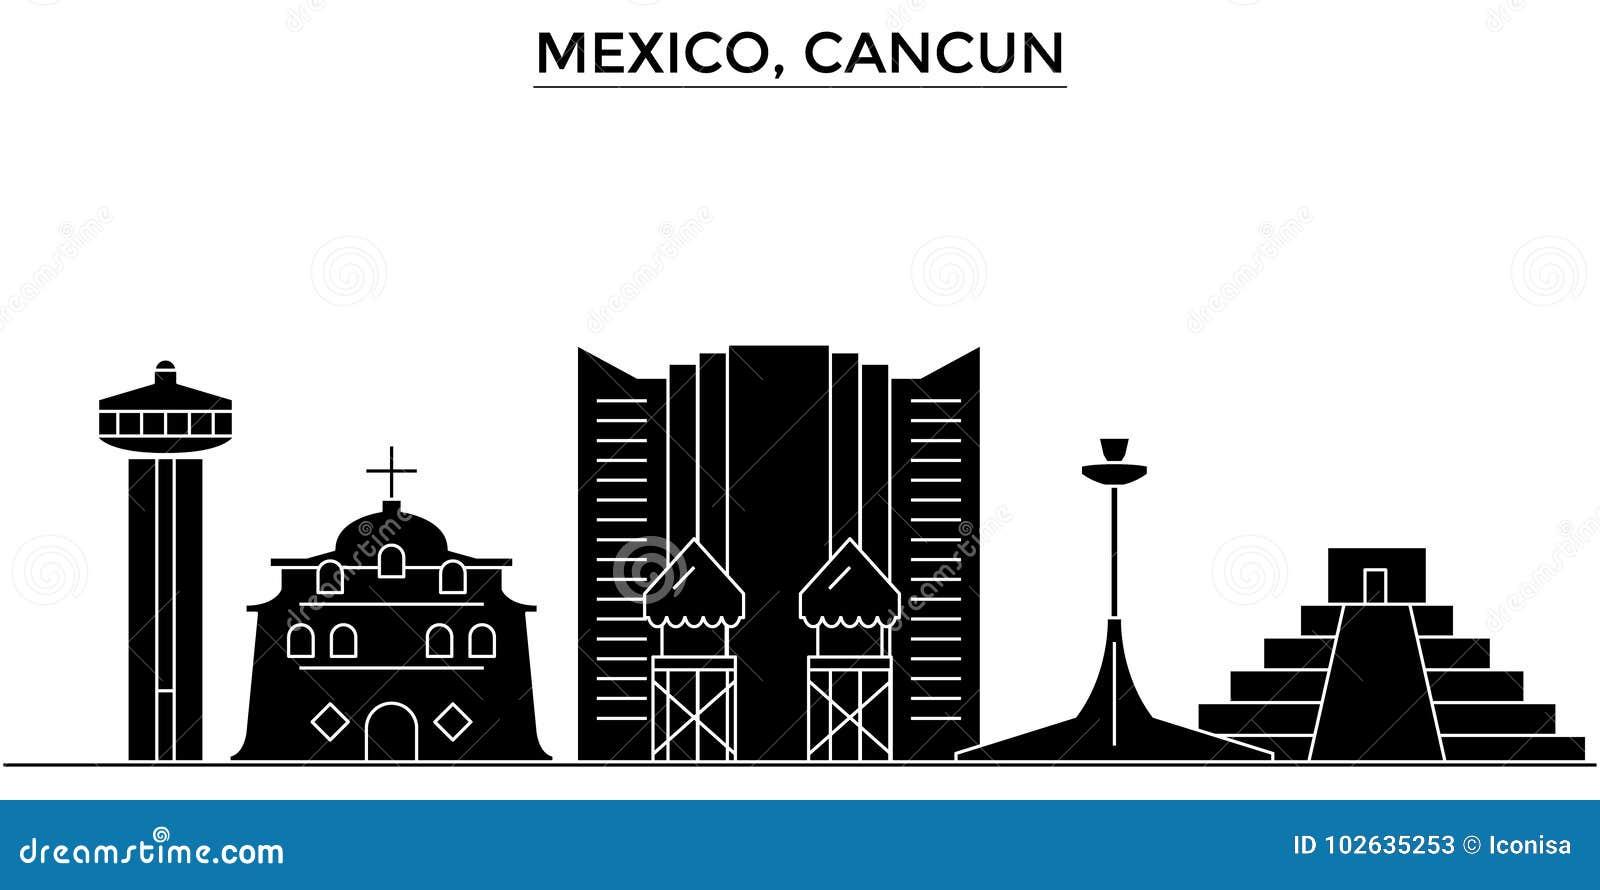 Mexico Cancun Architecture Vector City Skyline Travel Cityscape